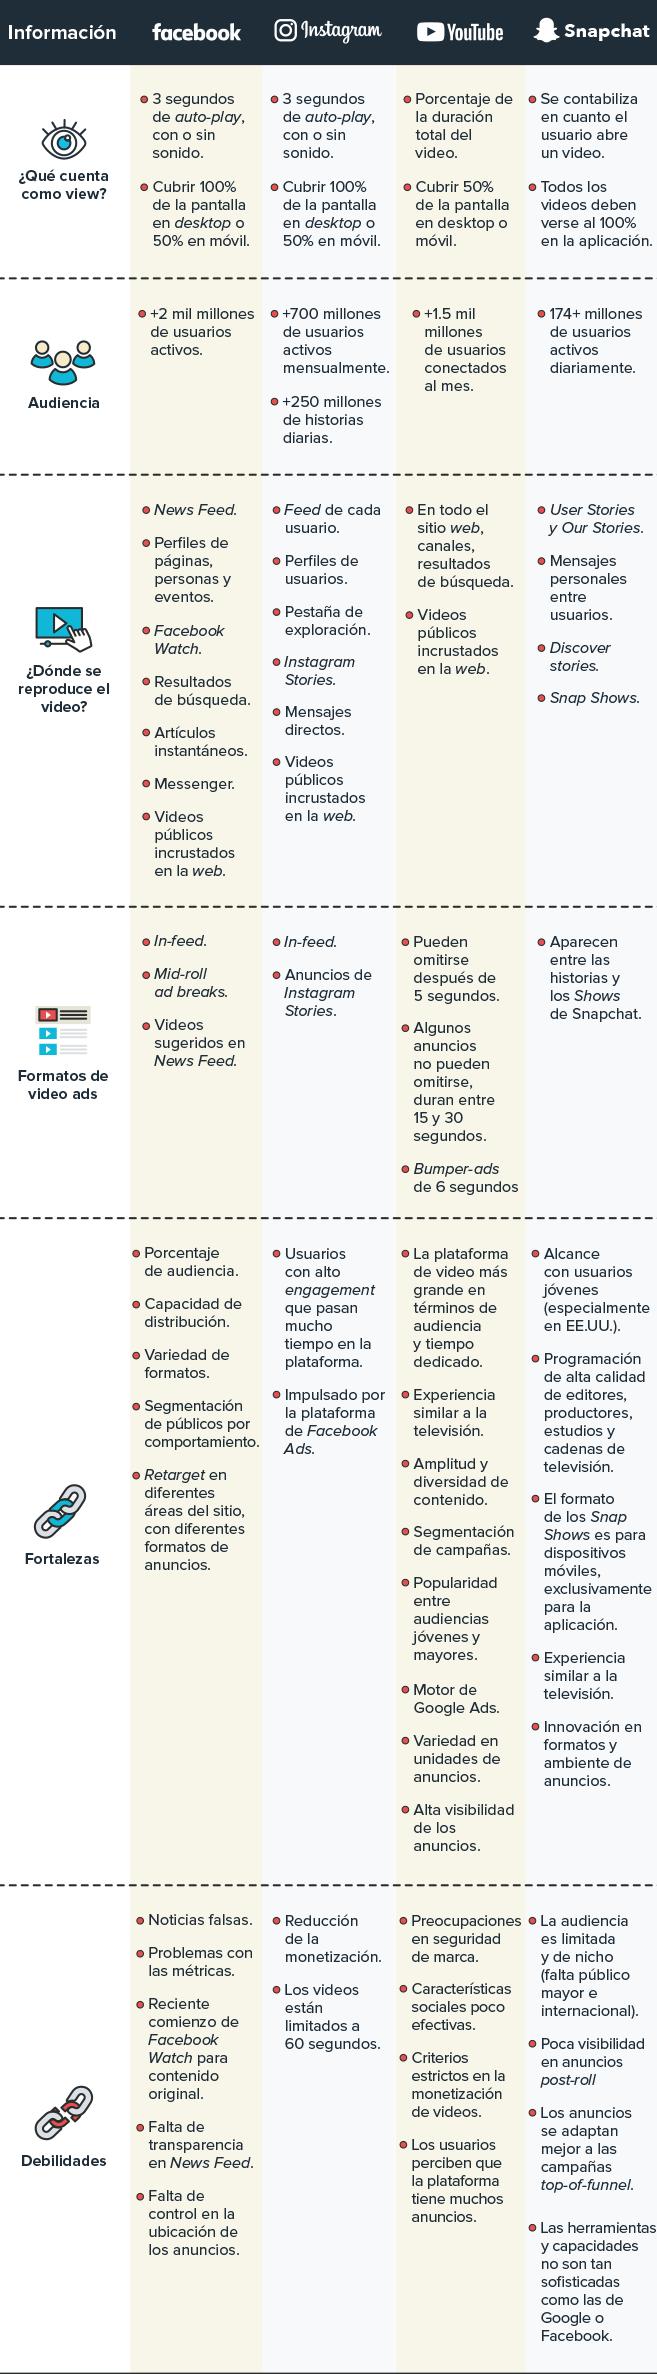 tabla-comparativa-canales-distribucion-video-marketing.png